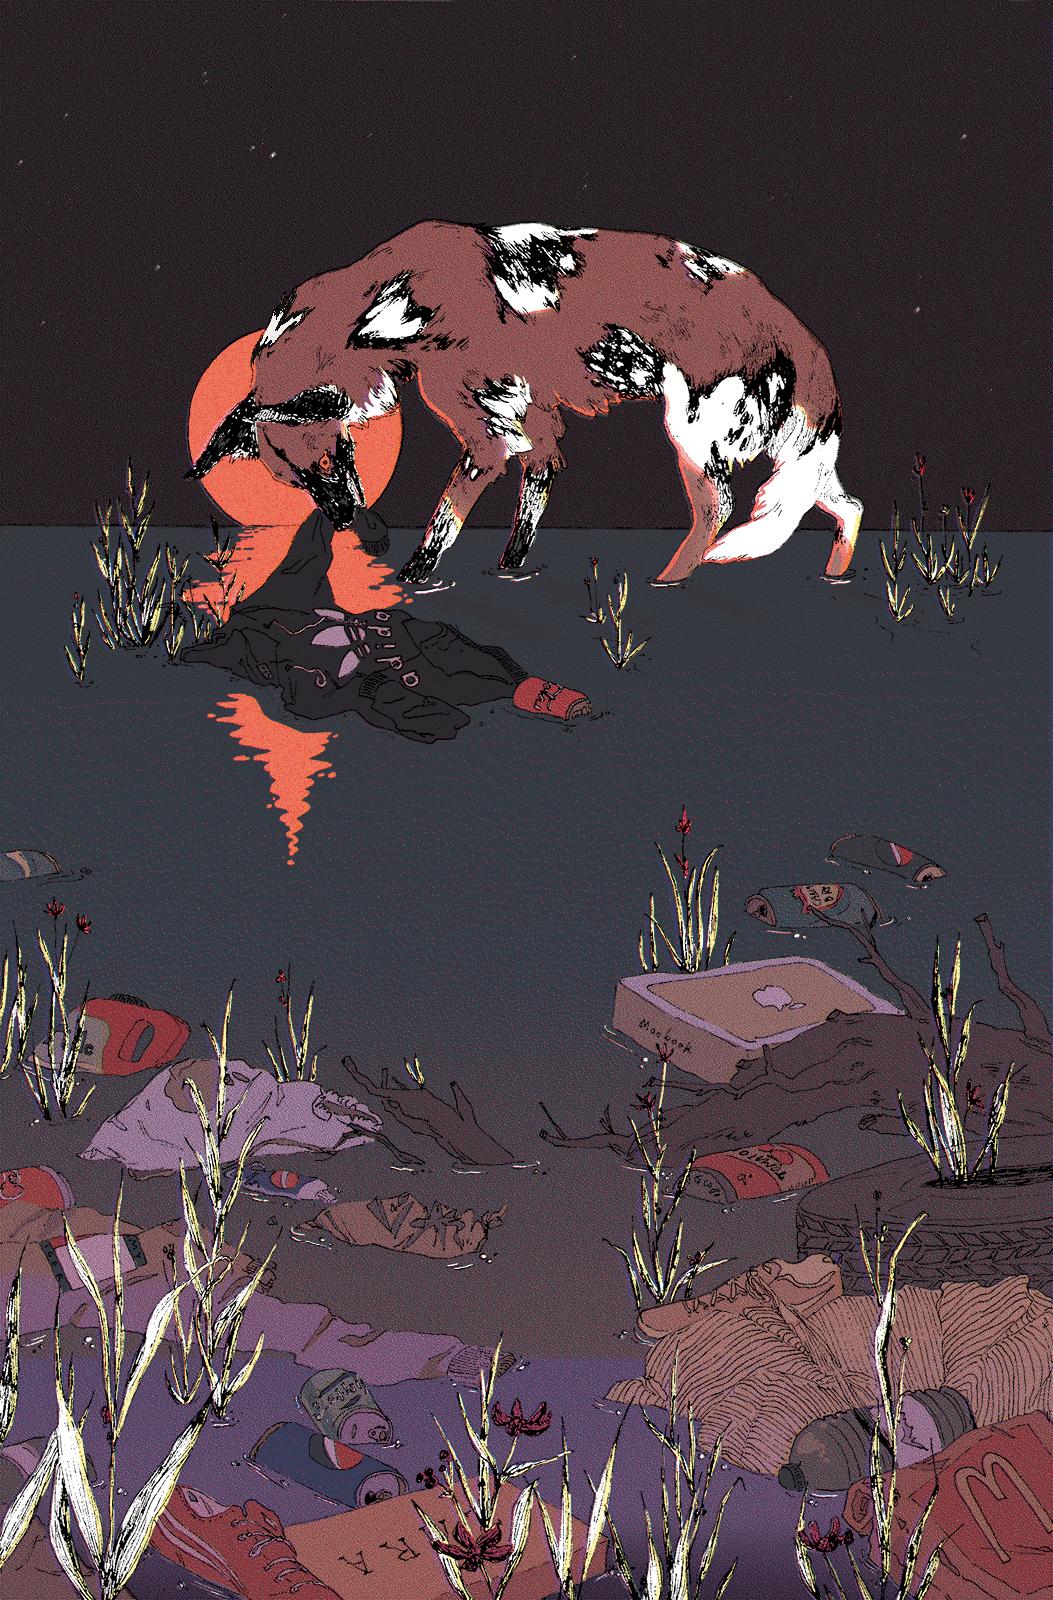 Illustration by Kima Lenaghan